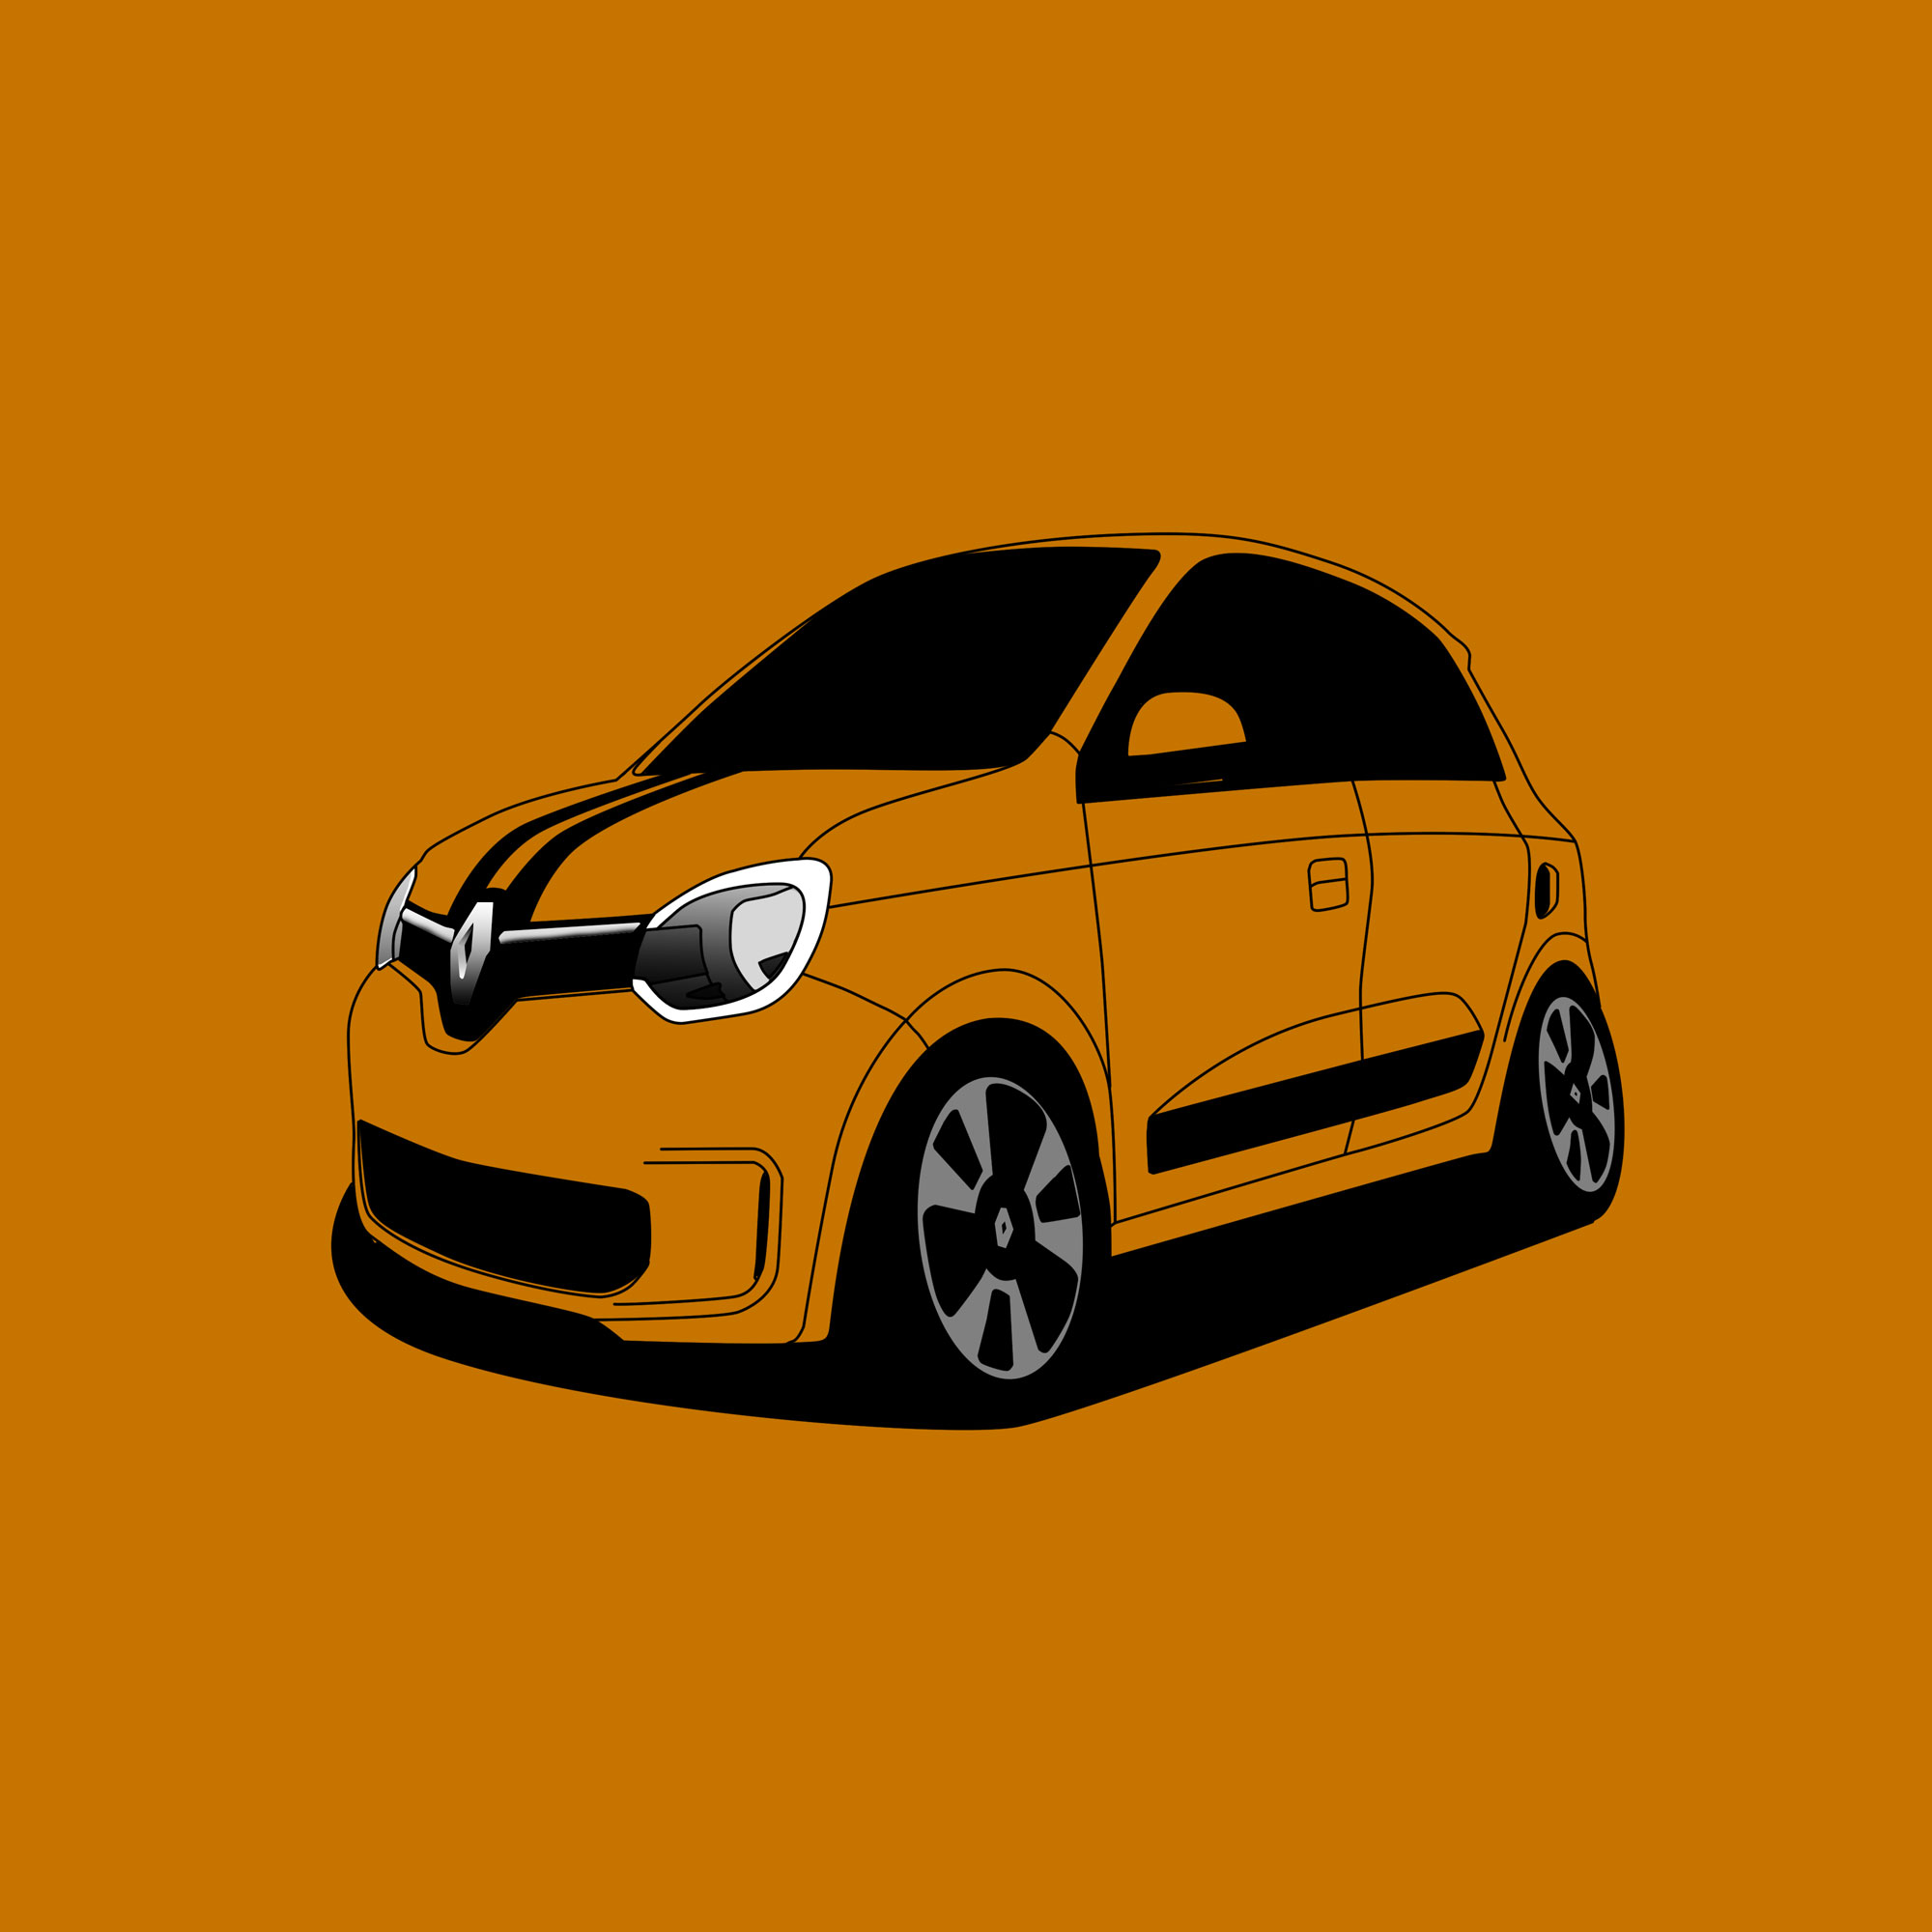 Renault Twingo 3 - Cartoon by vtstegofo